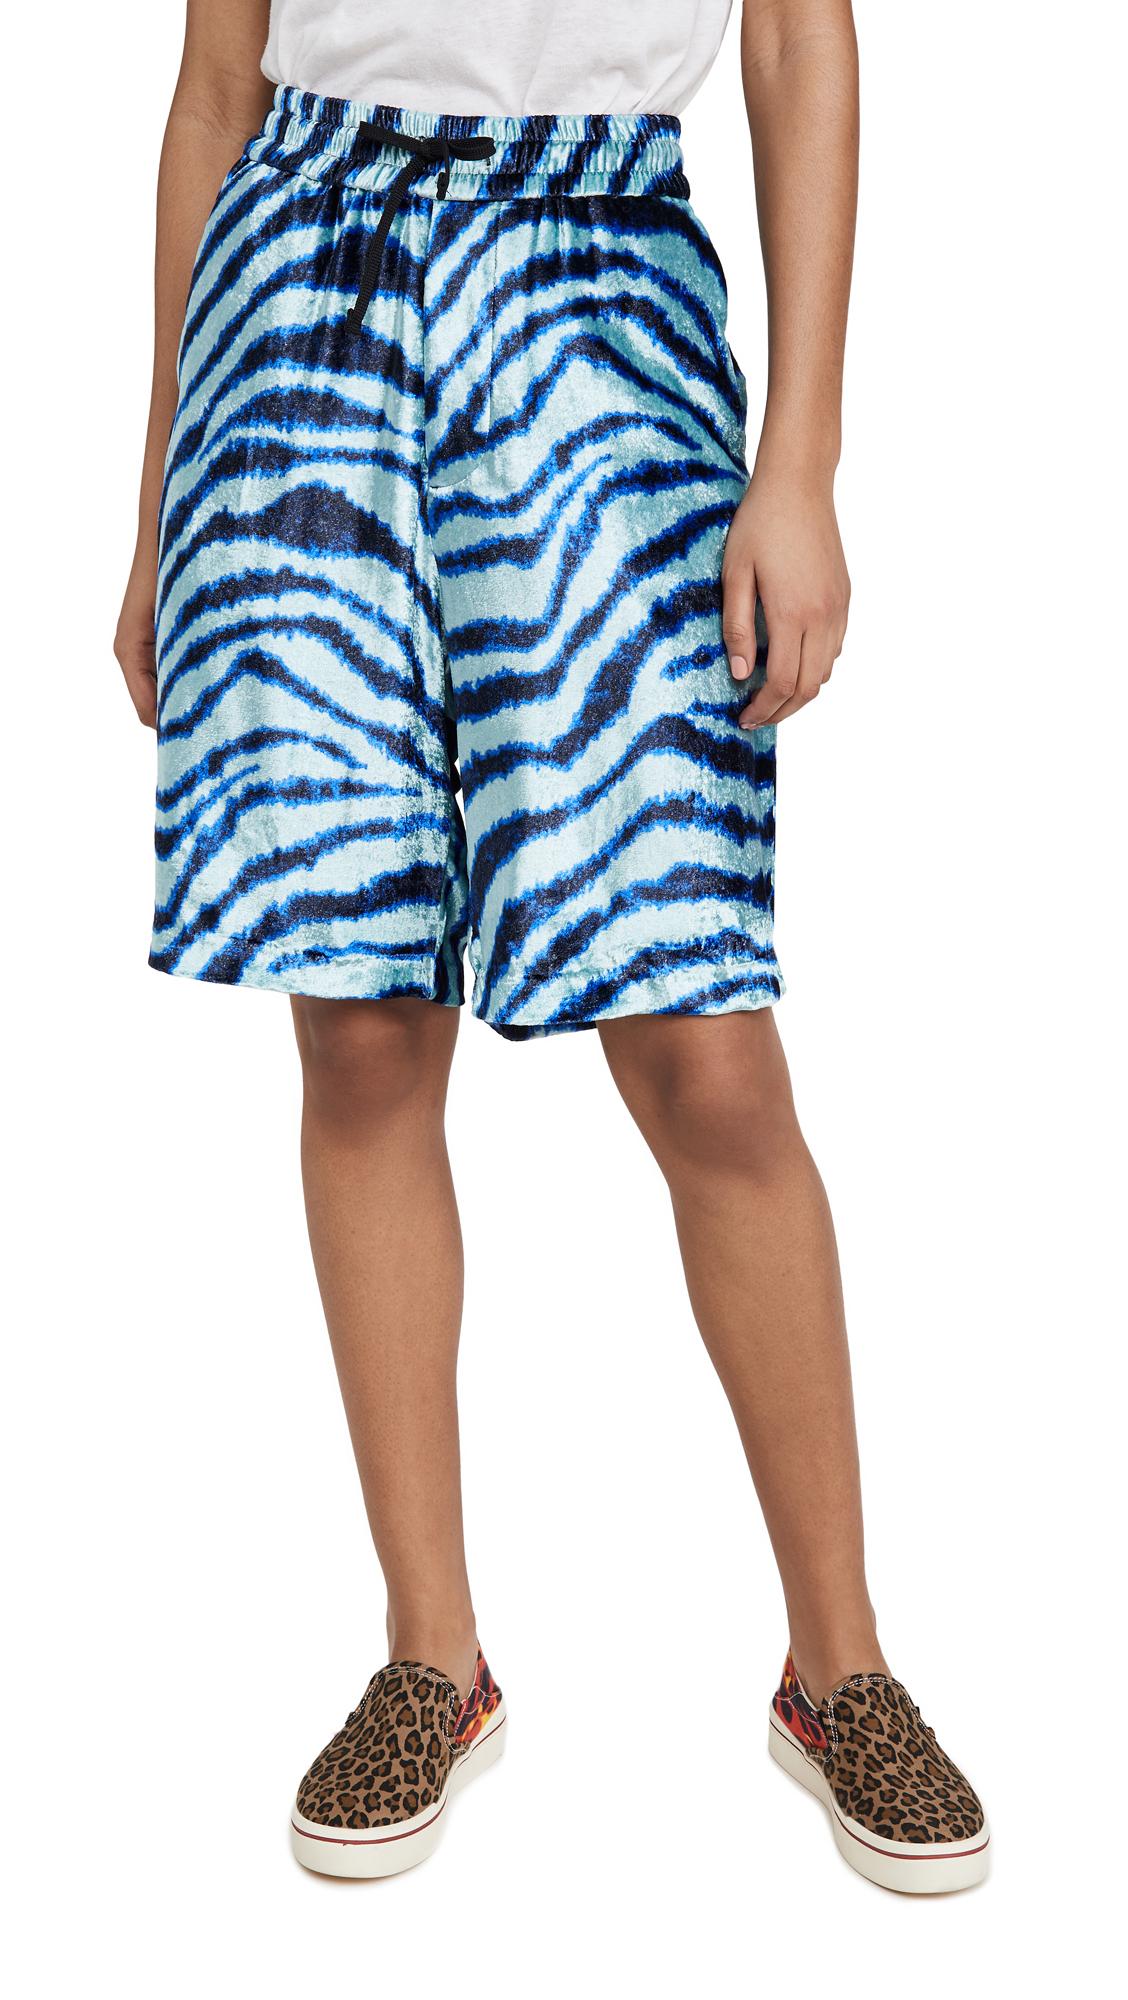 R13 Baggy Shorts